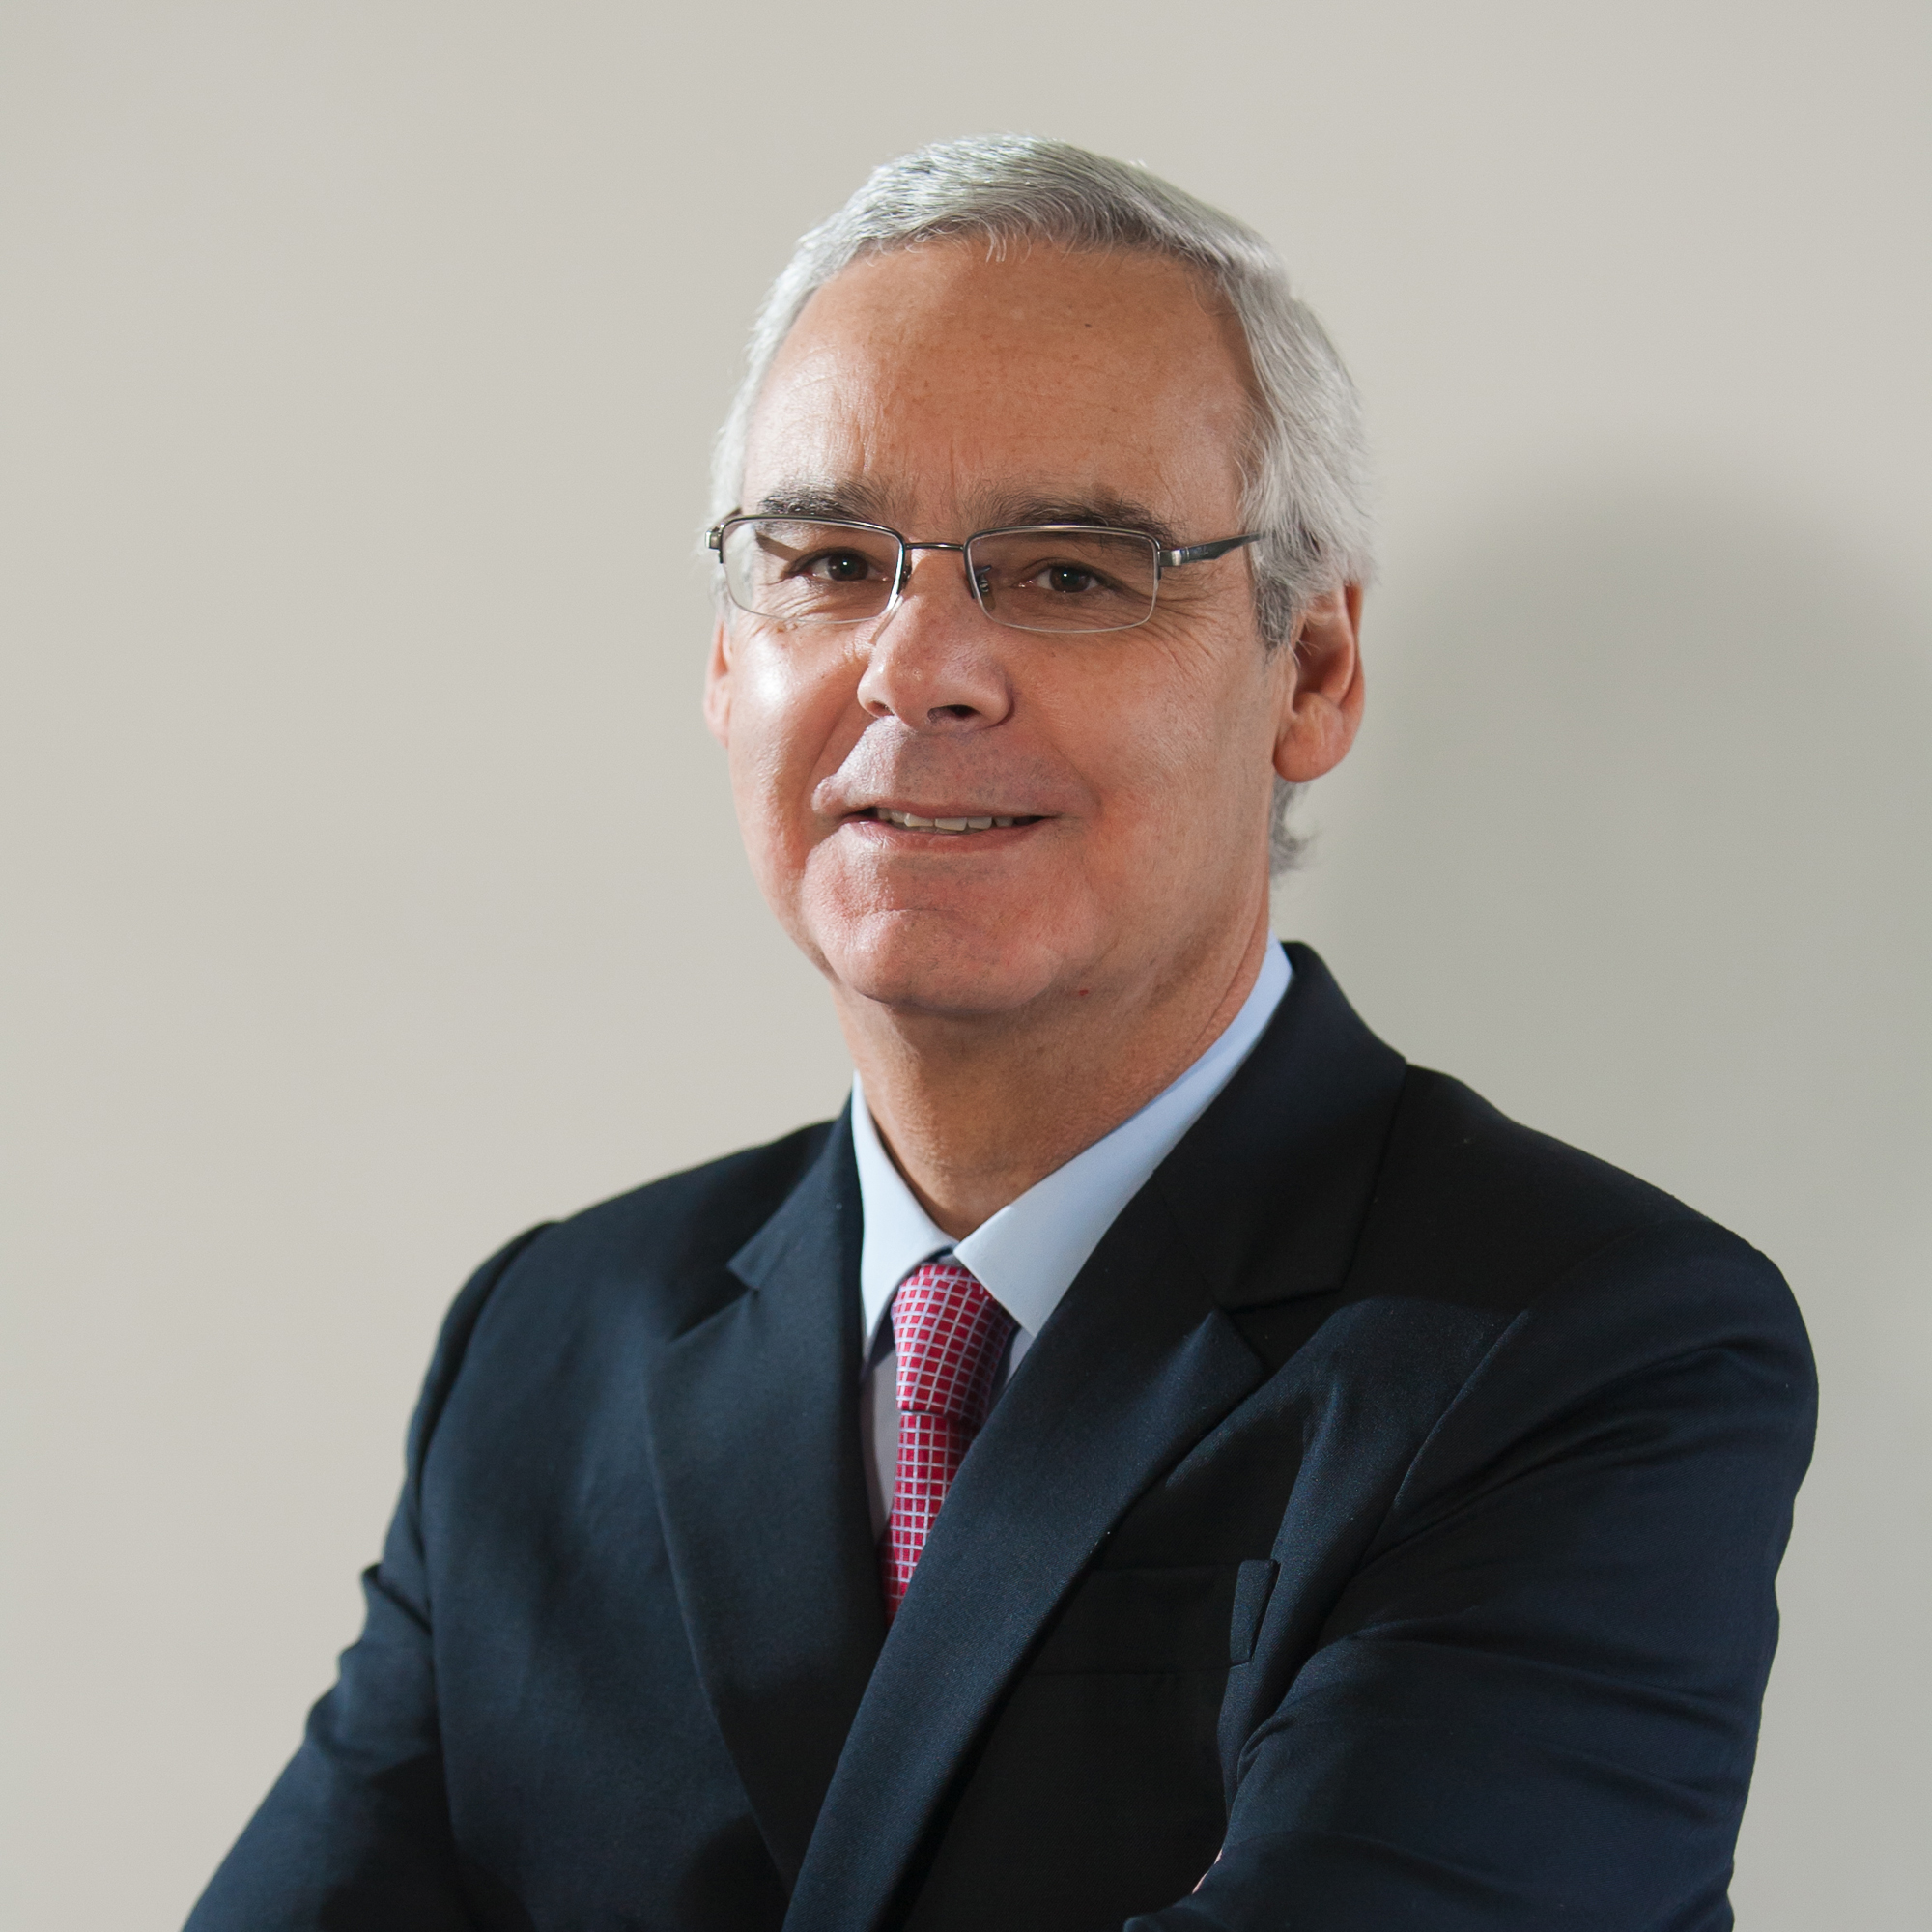 Gonzalo Rioseco Martínez